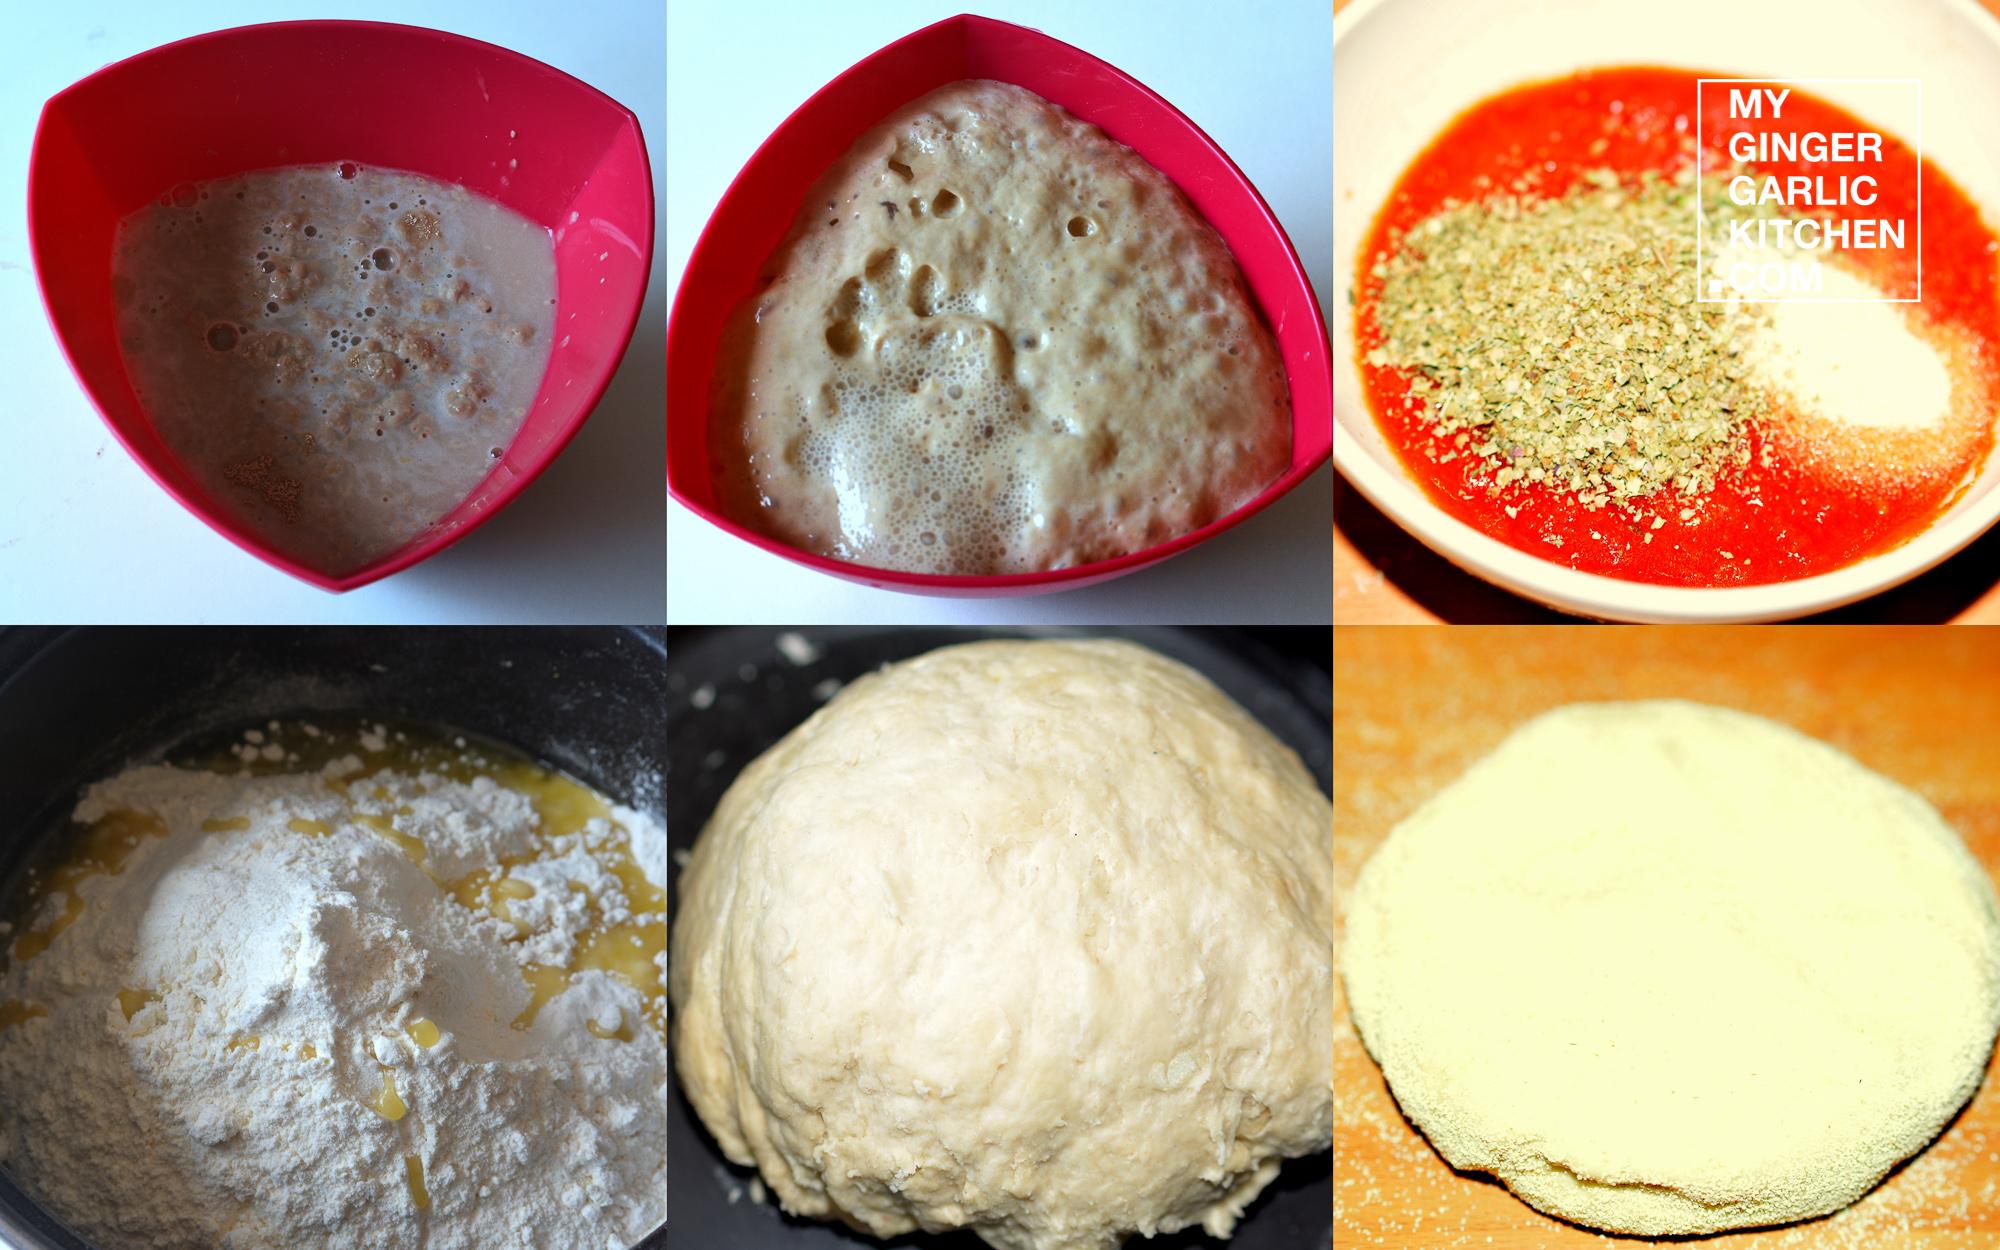 recipe-vegetable-pan-pizza-anupama-paliwal-my-ginger-garlic-kitchen-7